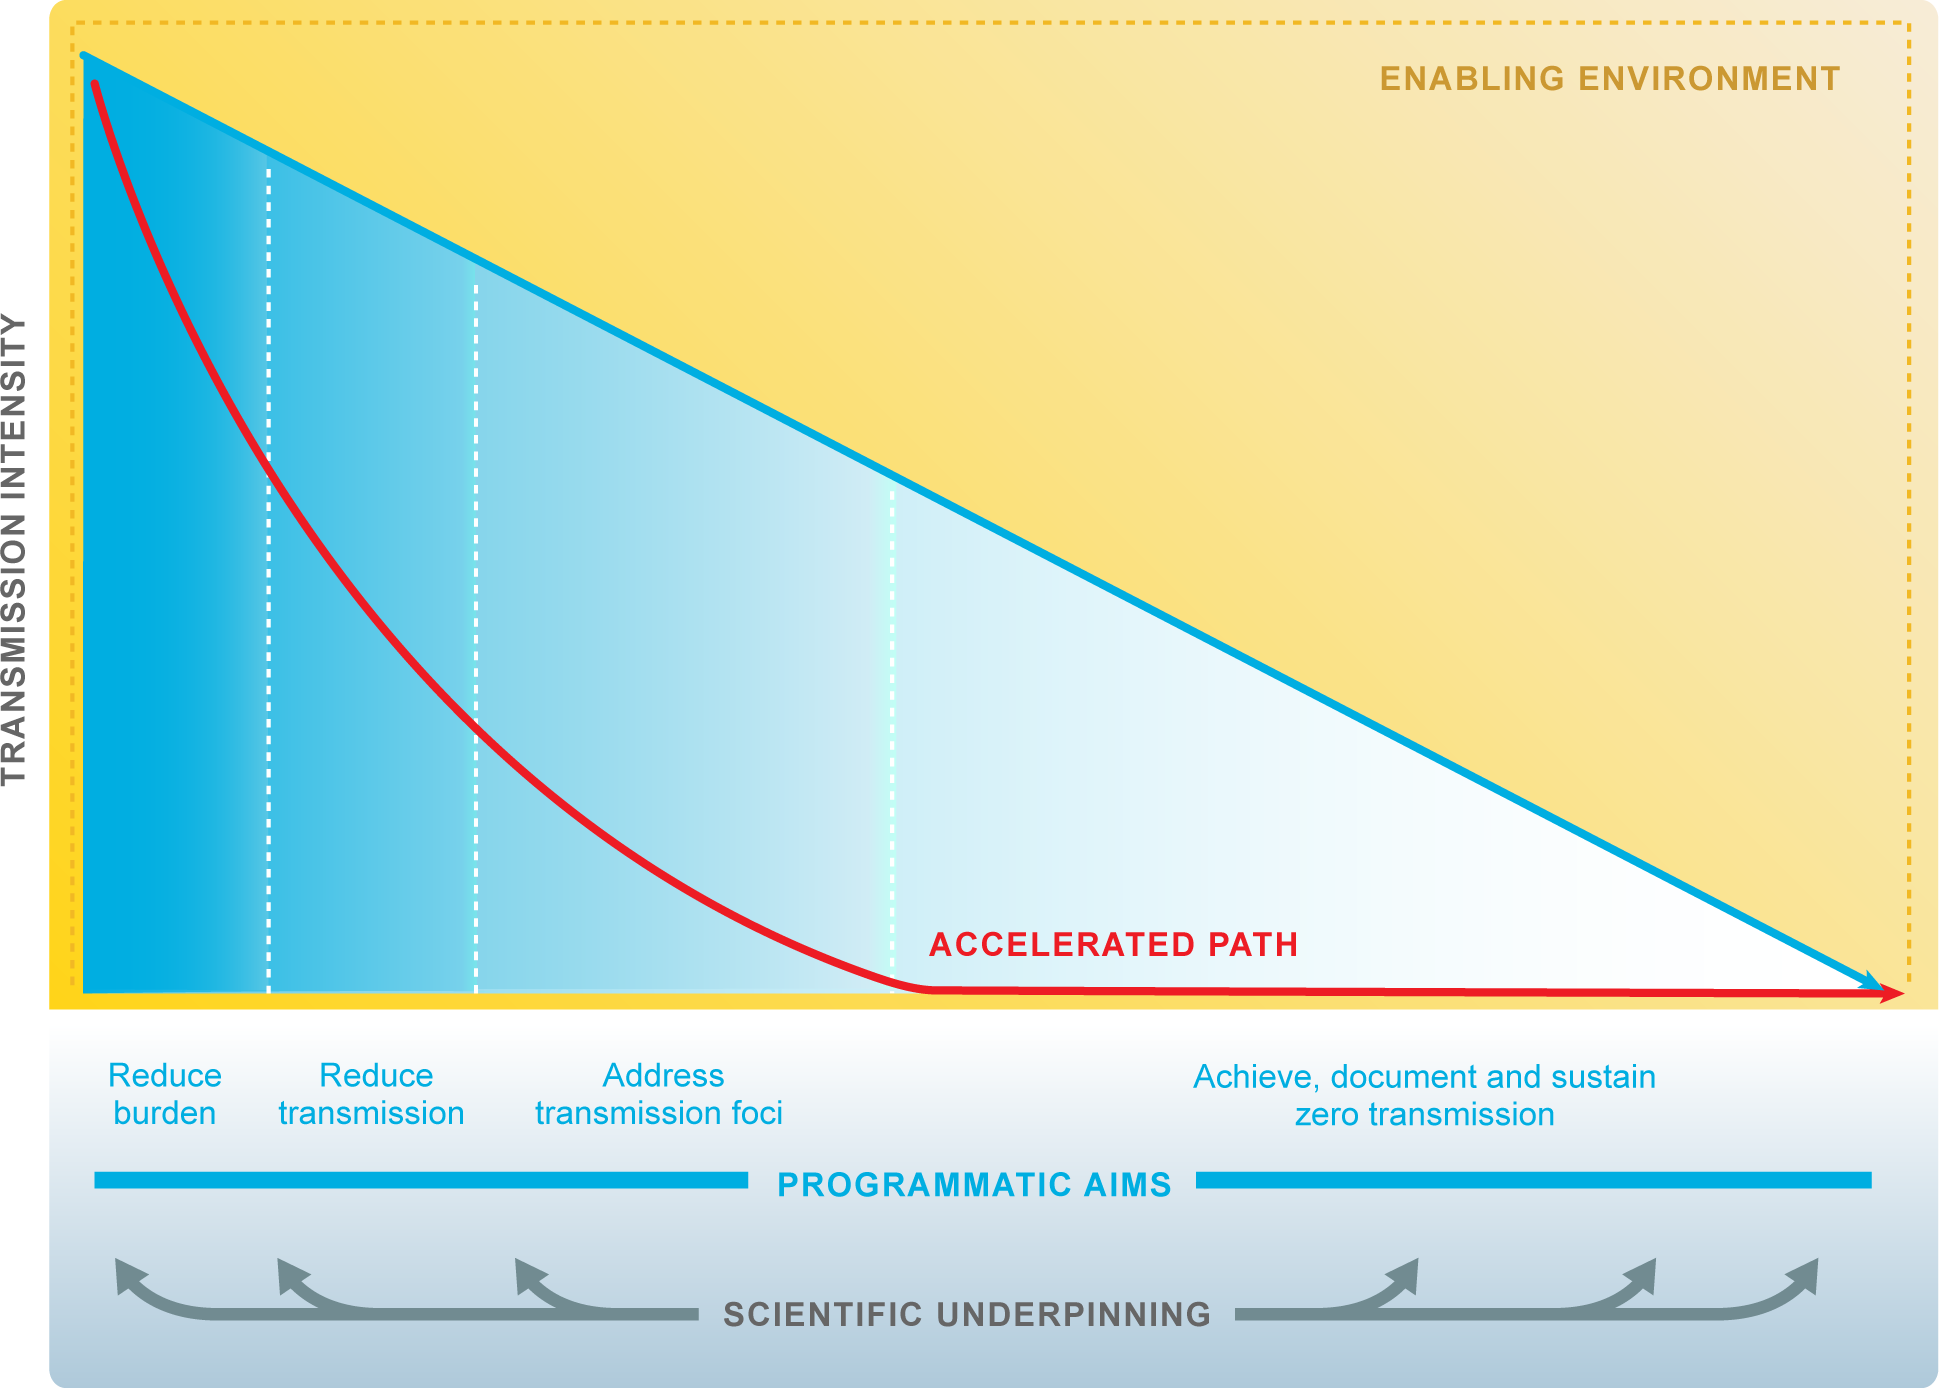 Research accelerates progress towards malaria elimination goals.